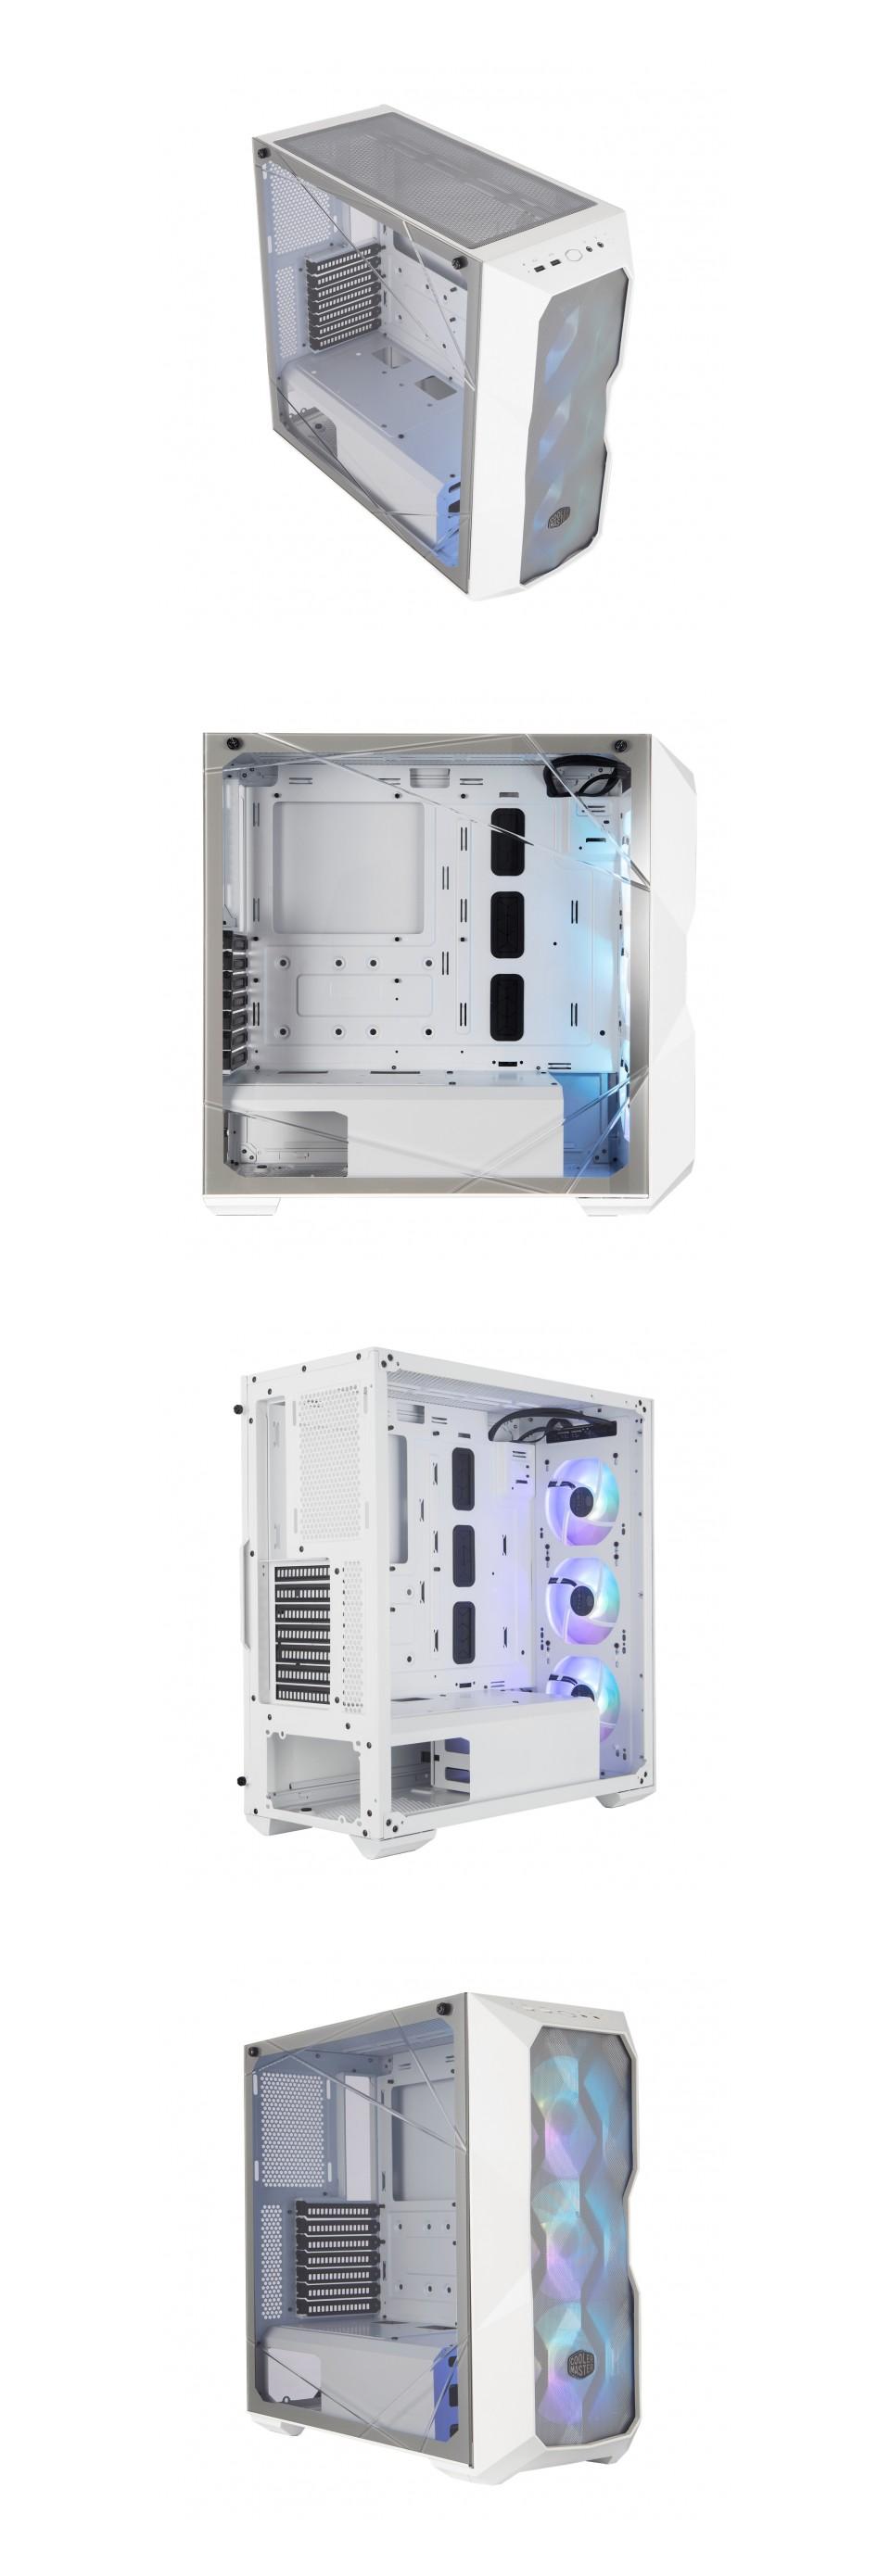 Cooler Master MasterBox TD500 ARGB Mesh Case White product